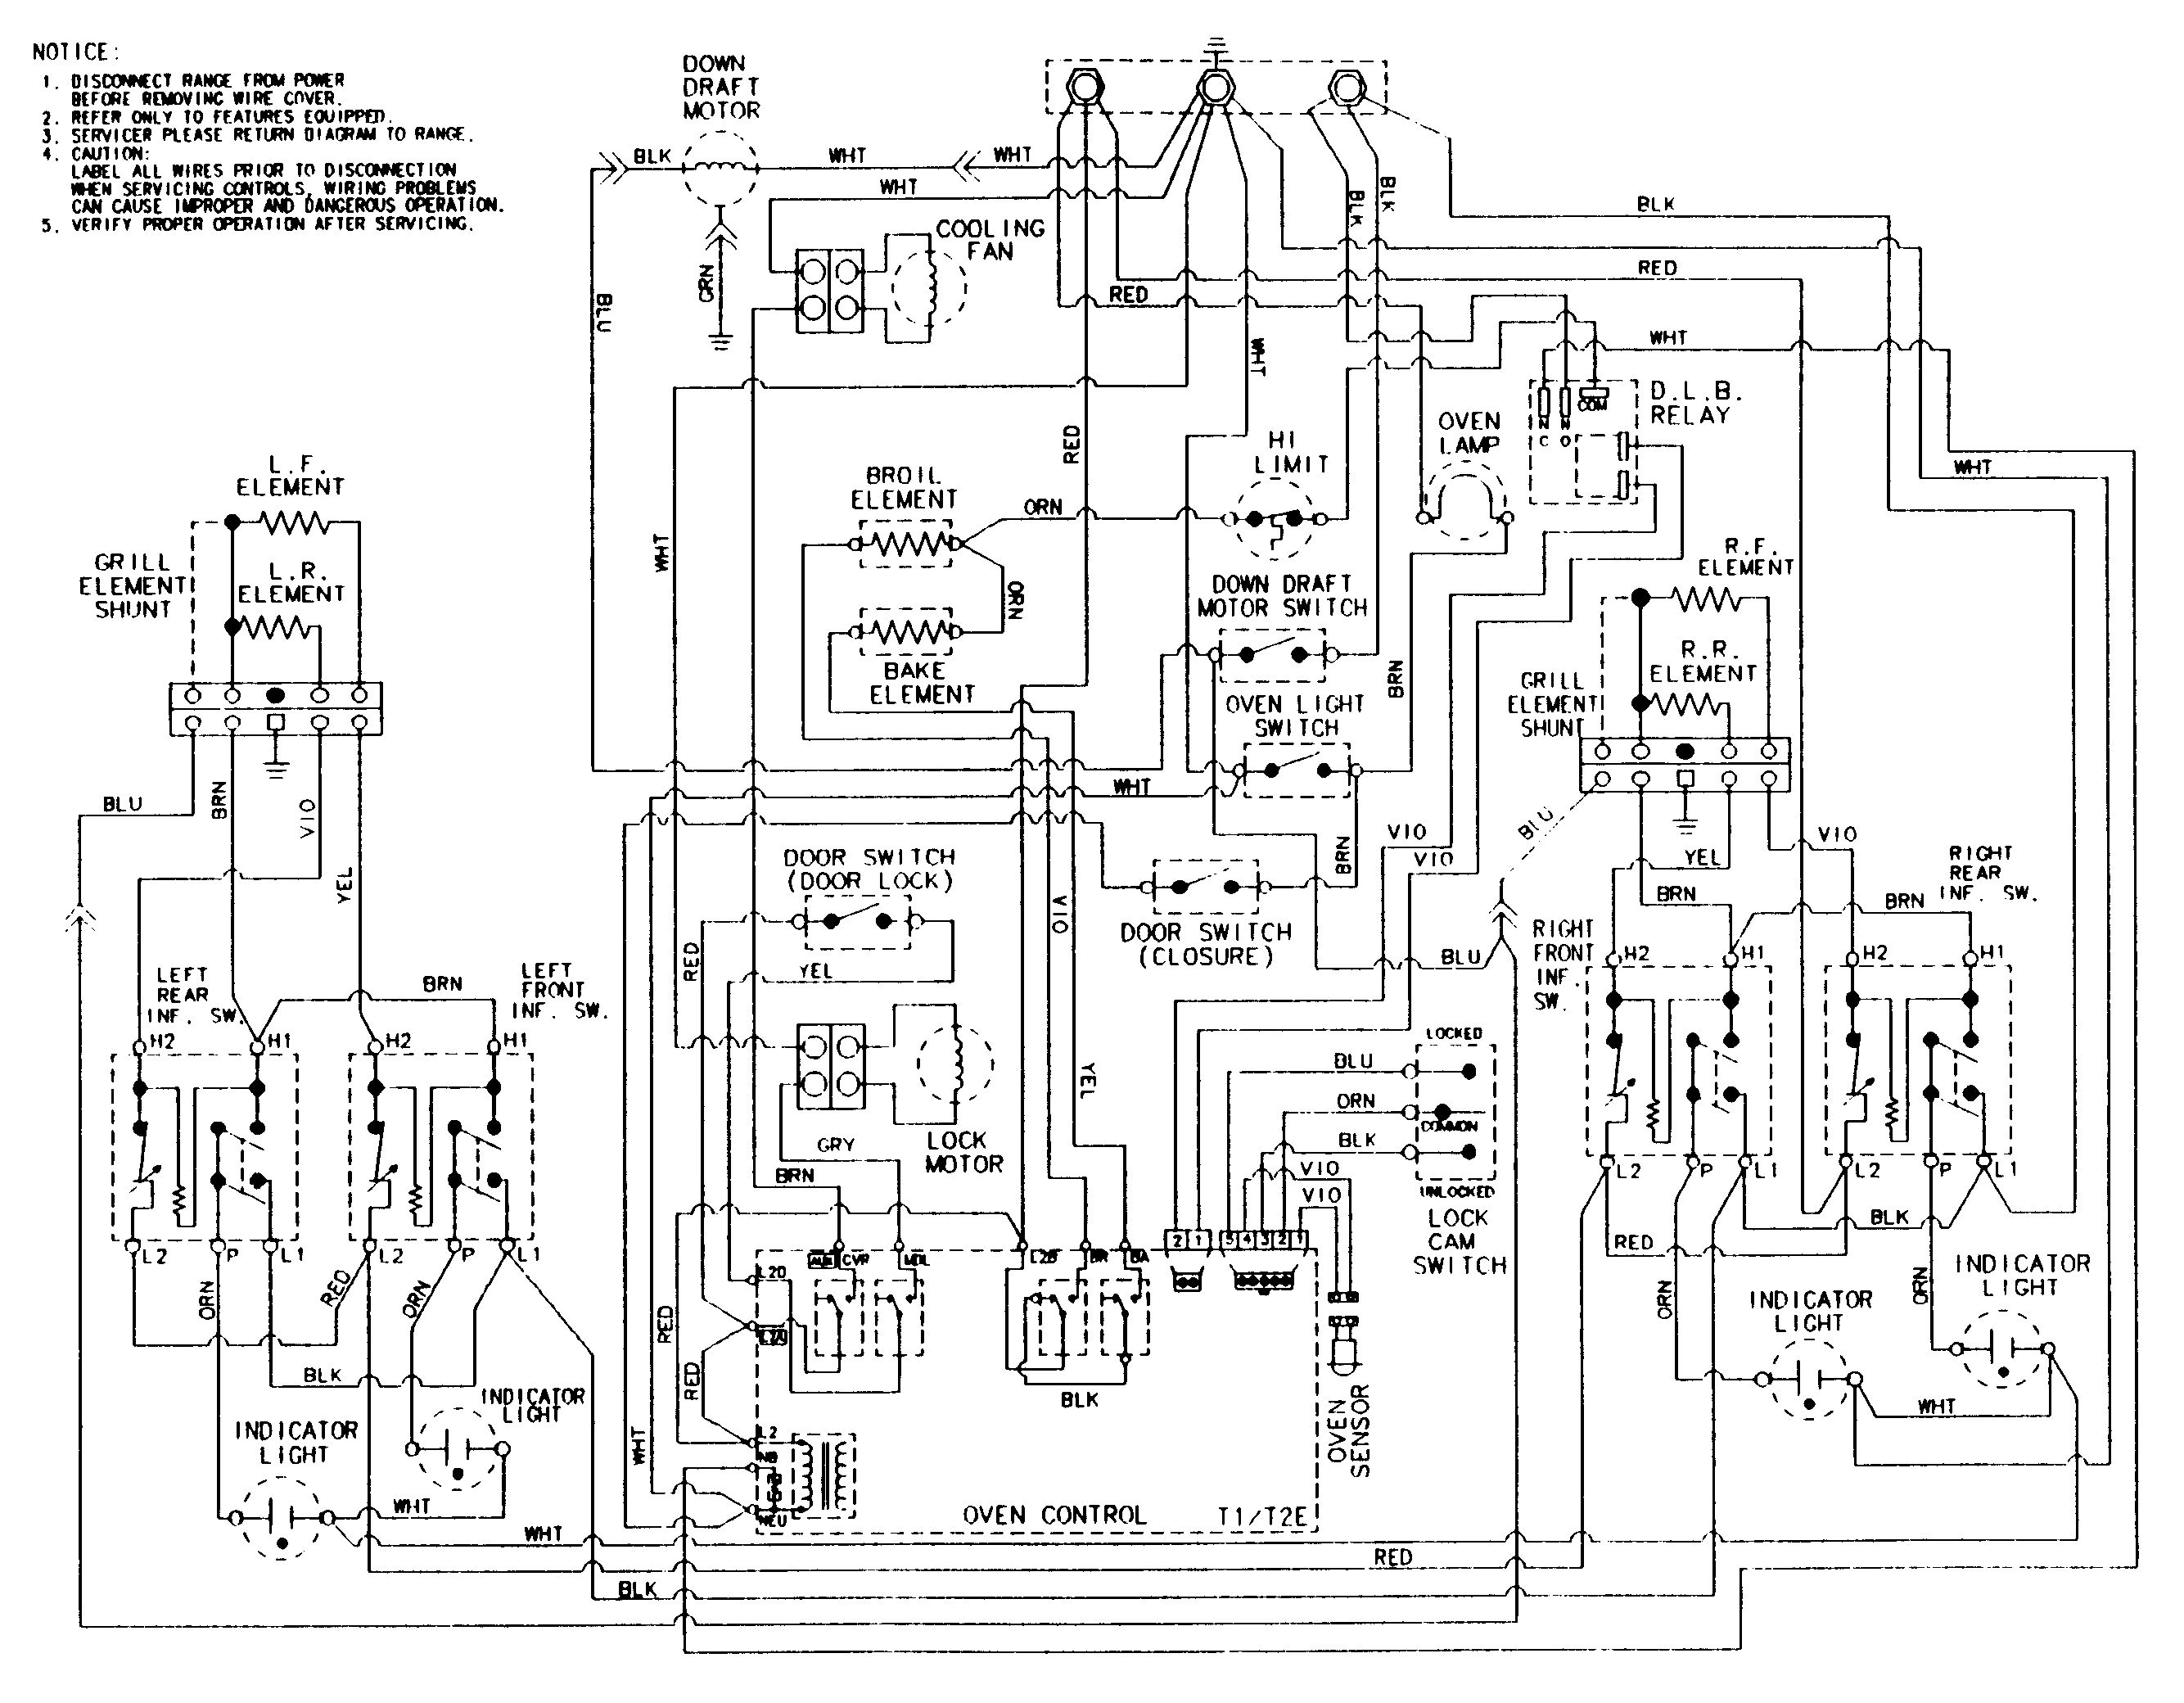 hight resolution of jenn air wiring diagrams wiring diagram query jenn air range wiring diagram jenn air wiring diagrams